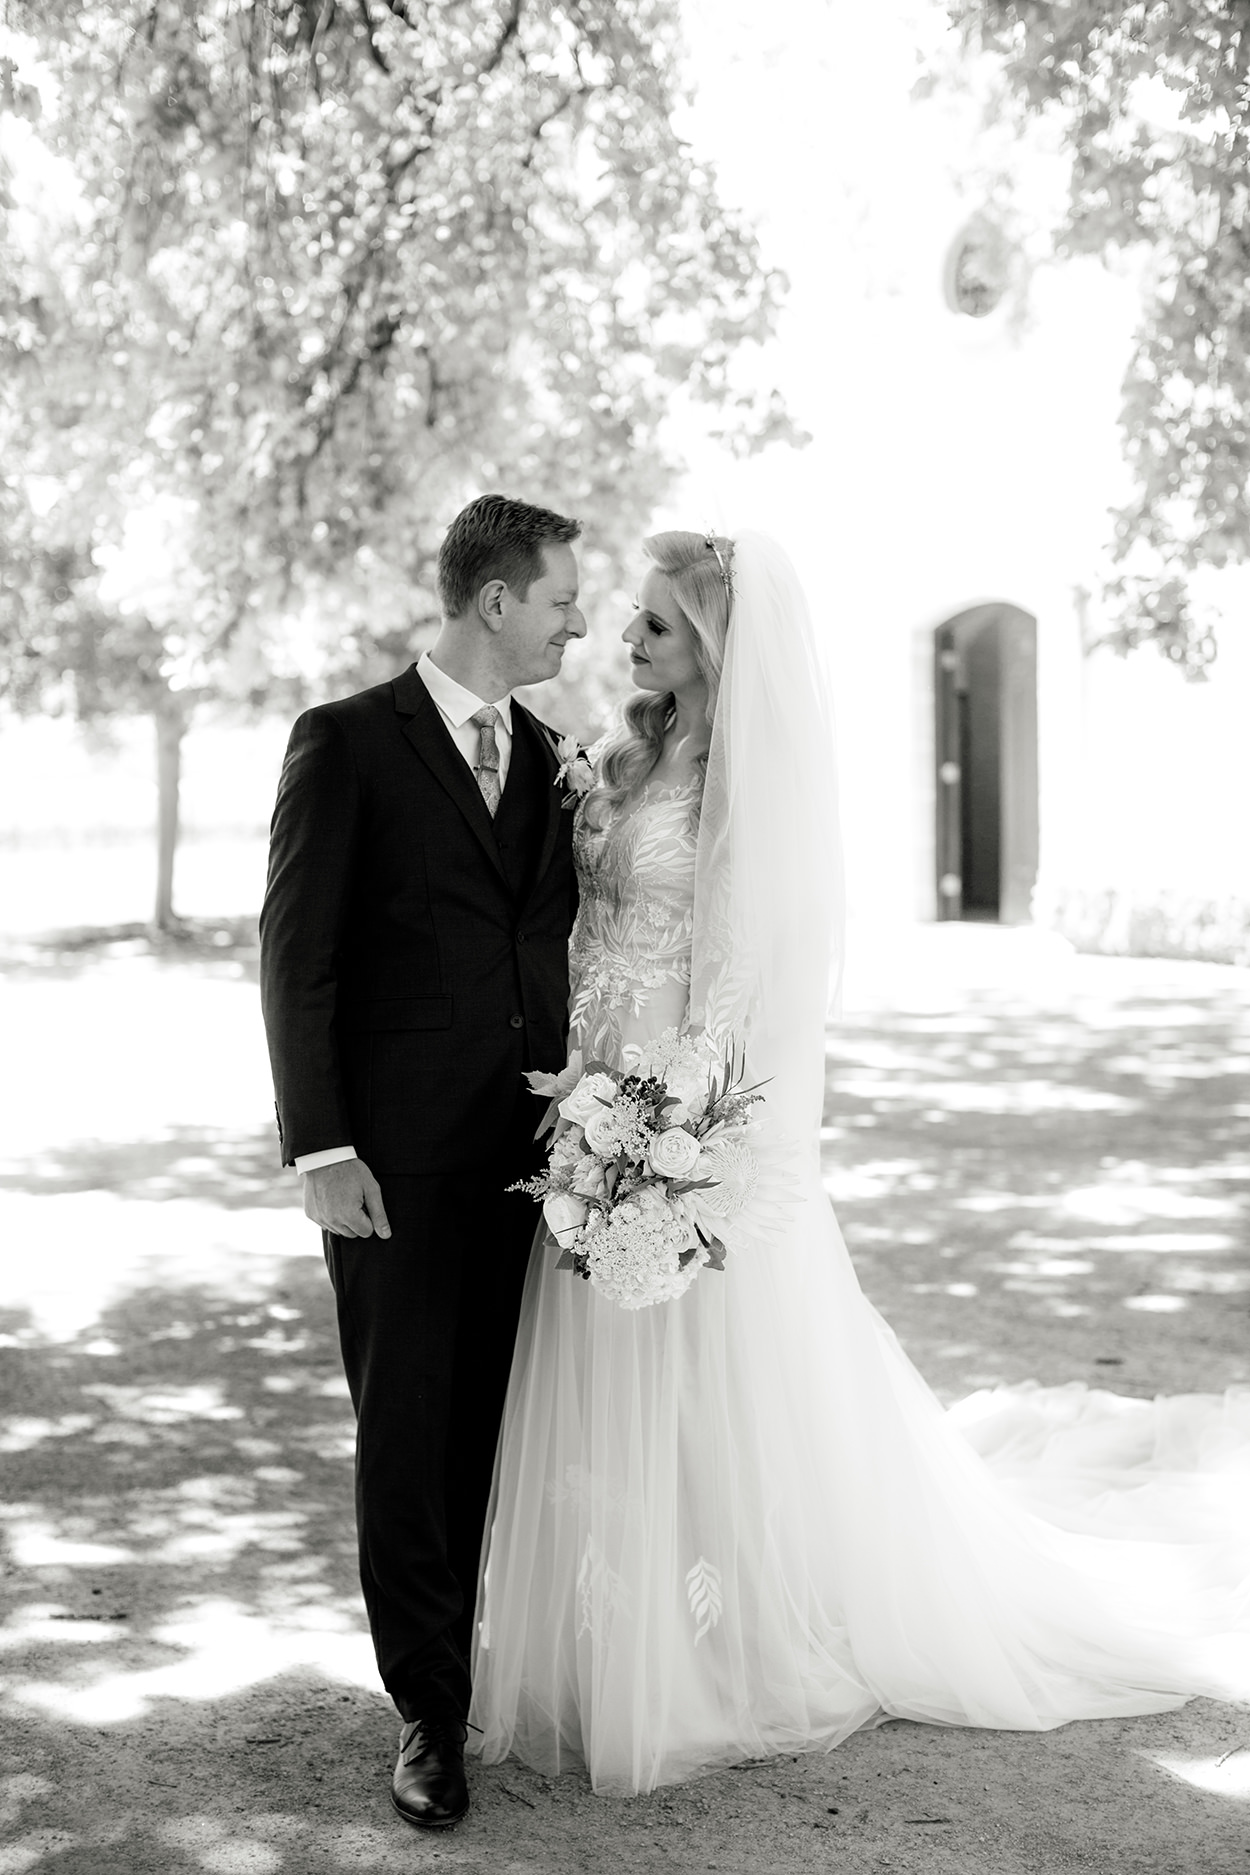 I-Got-You-Babe-Weddings0004.JPG